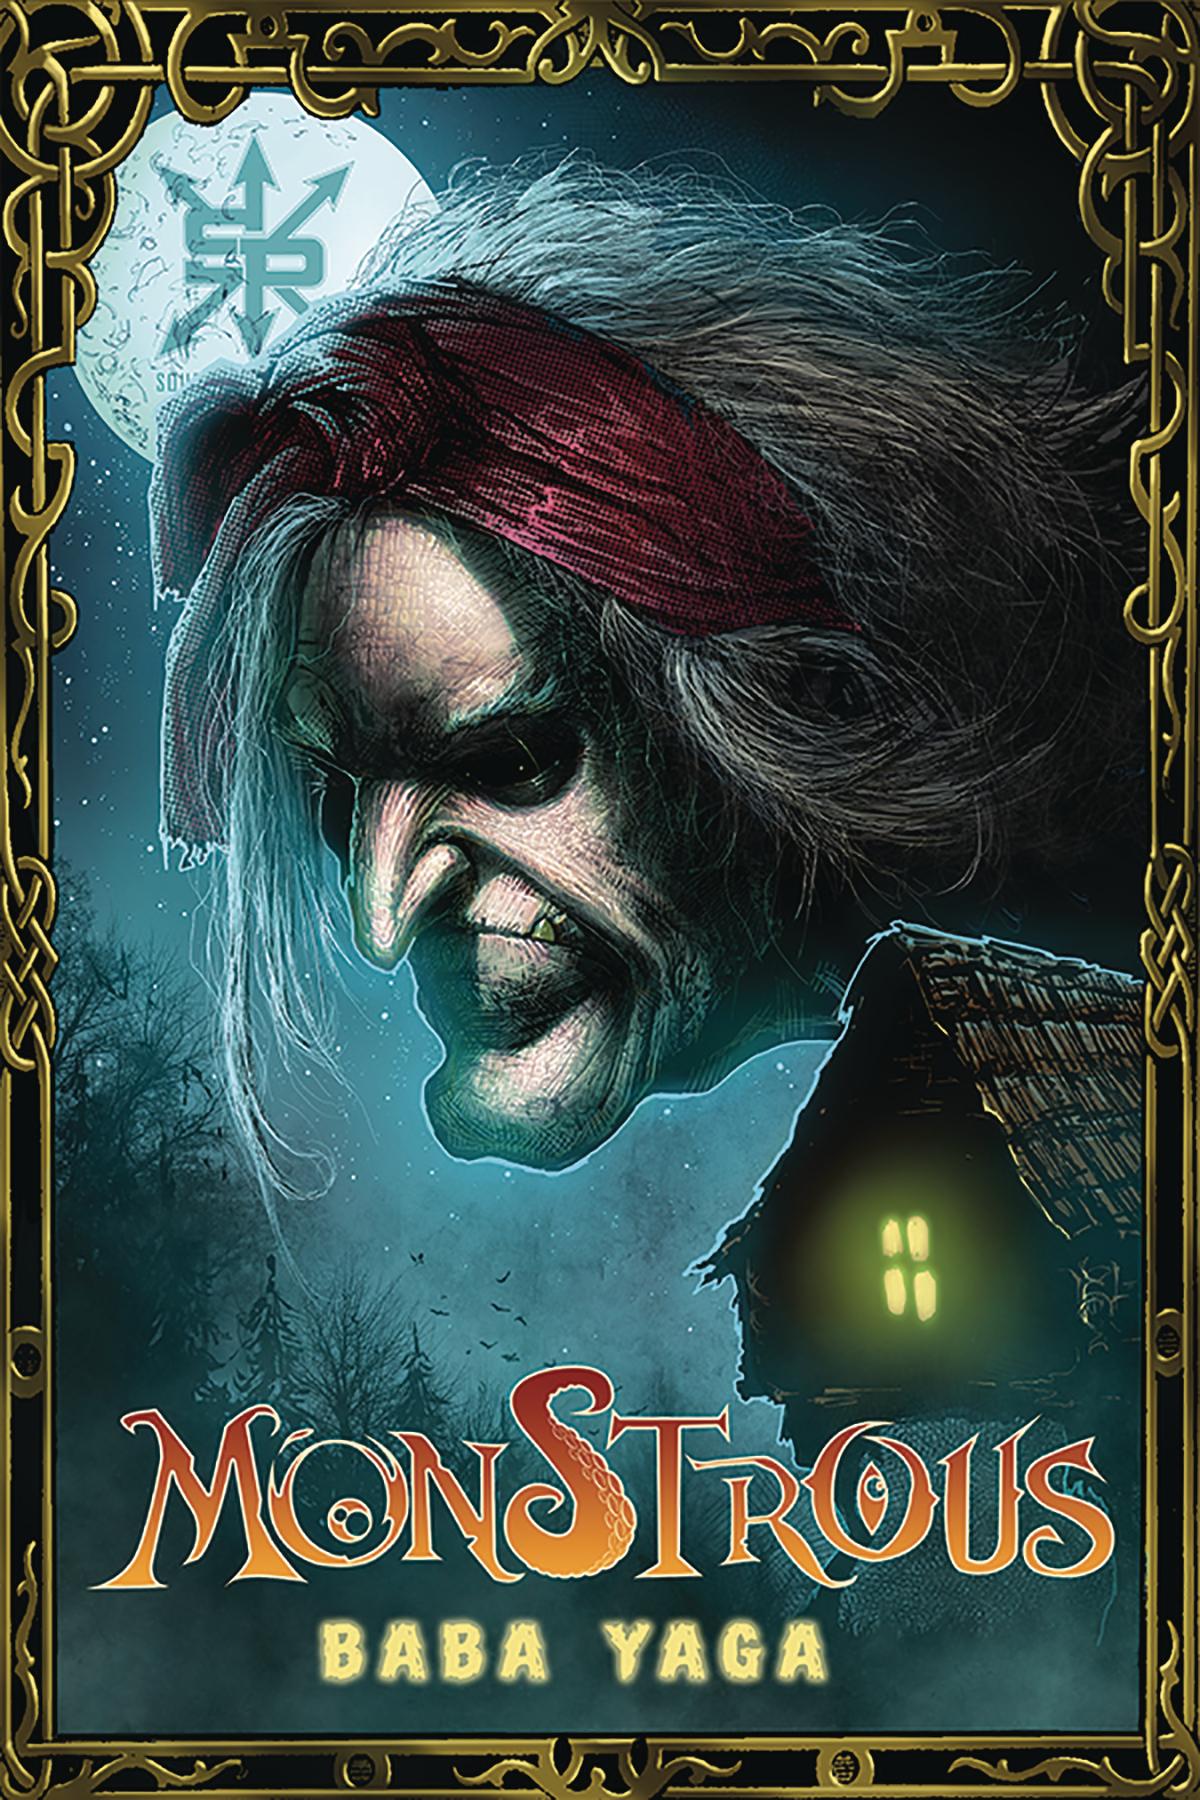 Monstrous, Baba Yaga